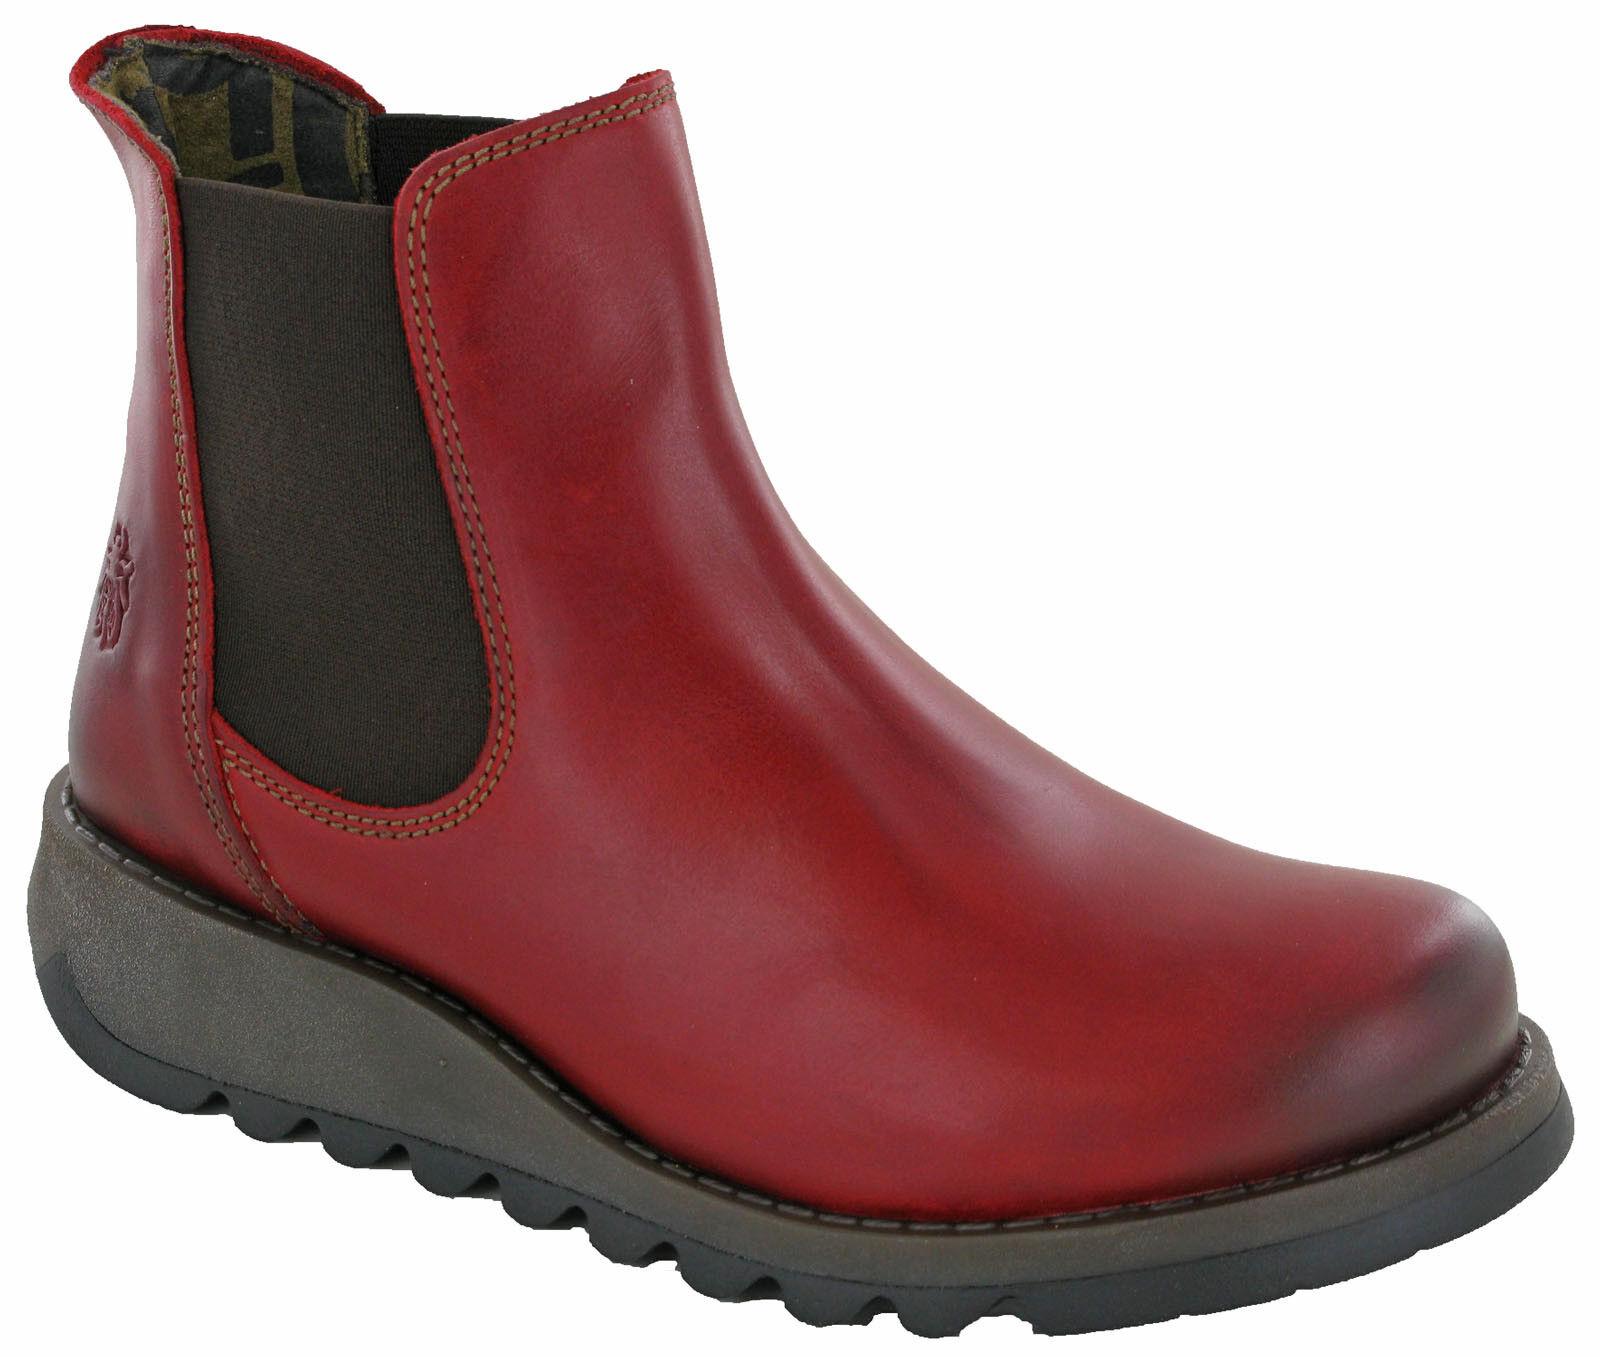 Fly London Dealer Stiefel damen Ankle Slip Leather Chelsea Riding Slip Ankle On Wedge UK 4-8 654d61